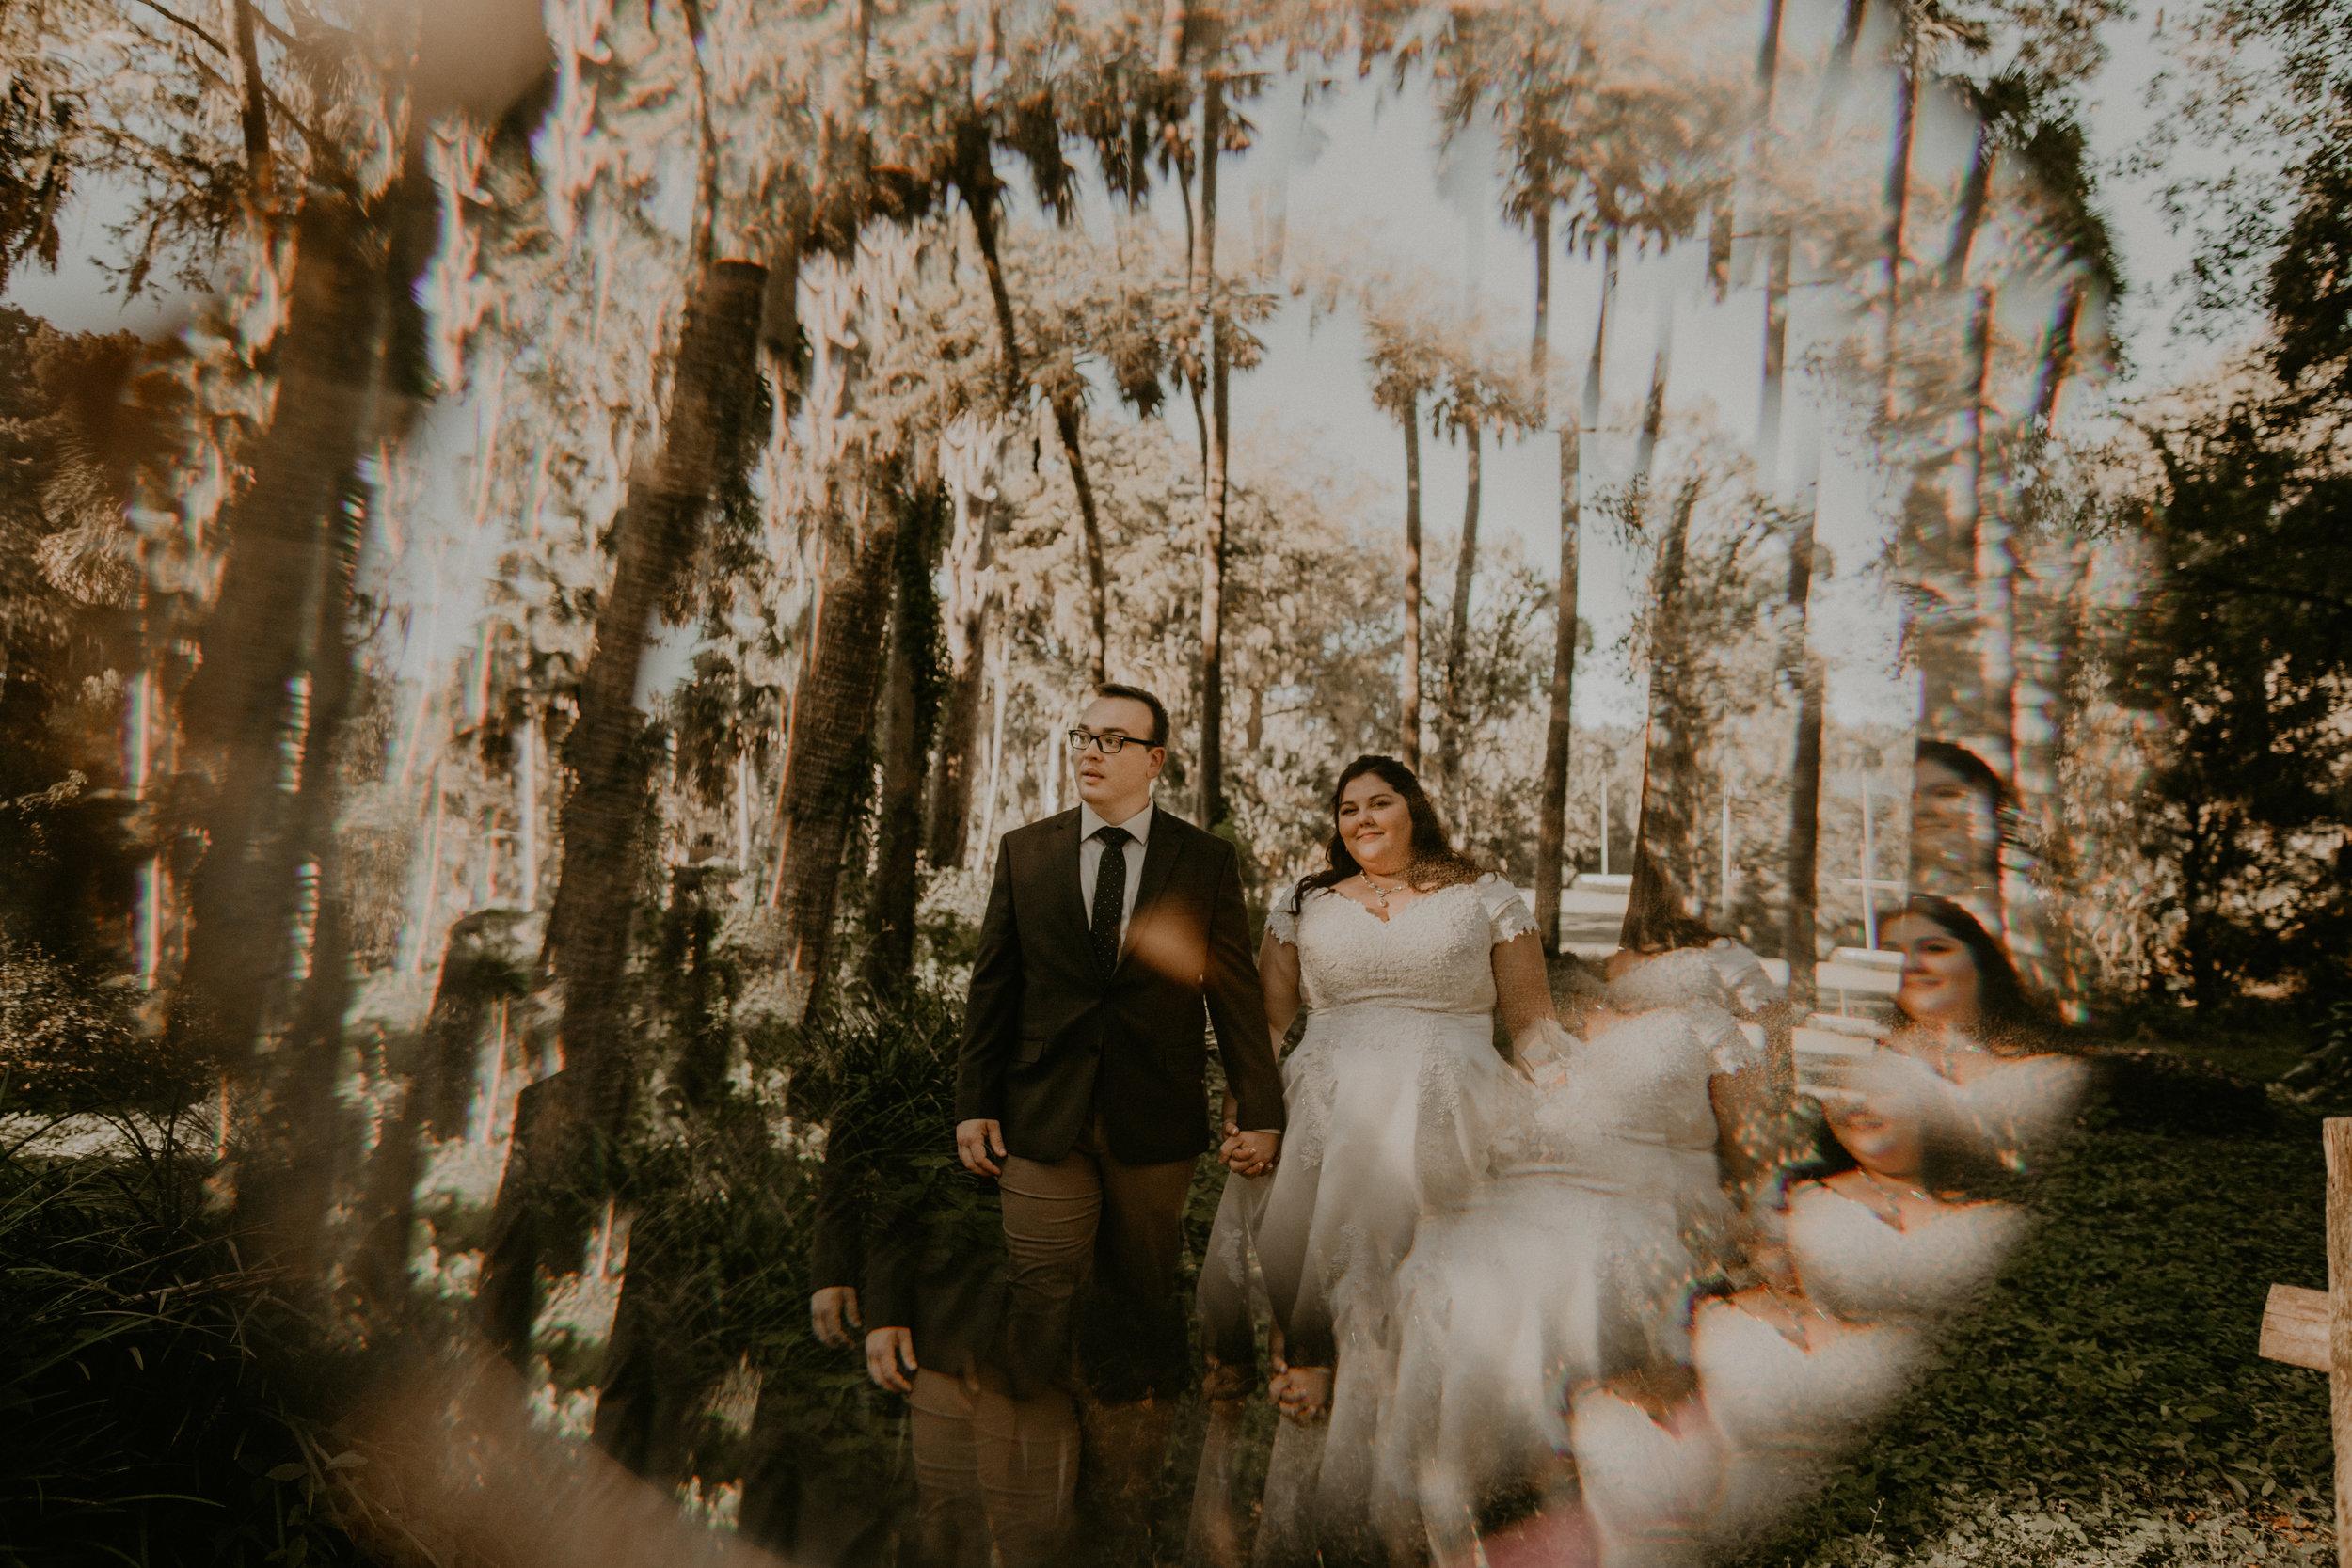 Silver Springs State Park Silver Springs Florida-Wedding-Kat and Tom33.JPG